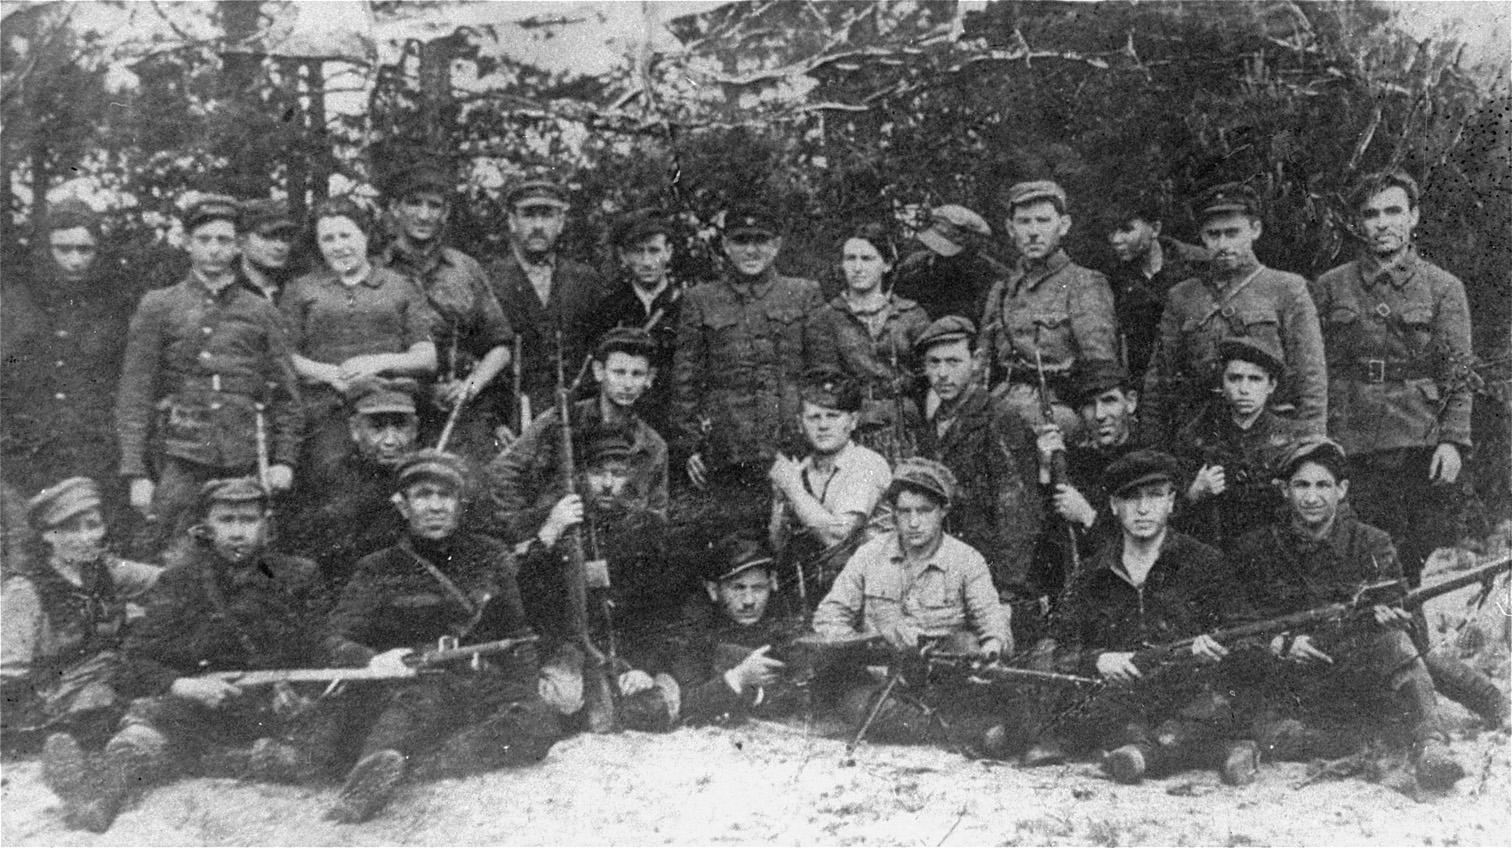 http://www.holocaustresearchproject.org/revolt/images/bielski.jpg